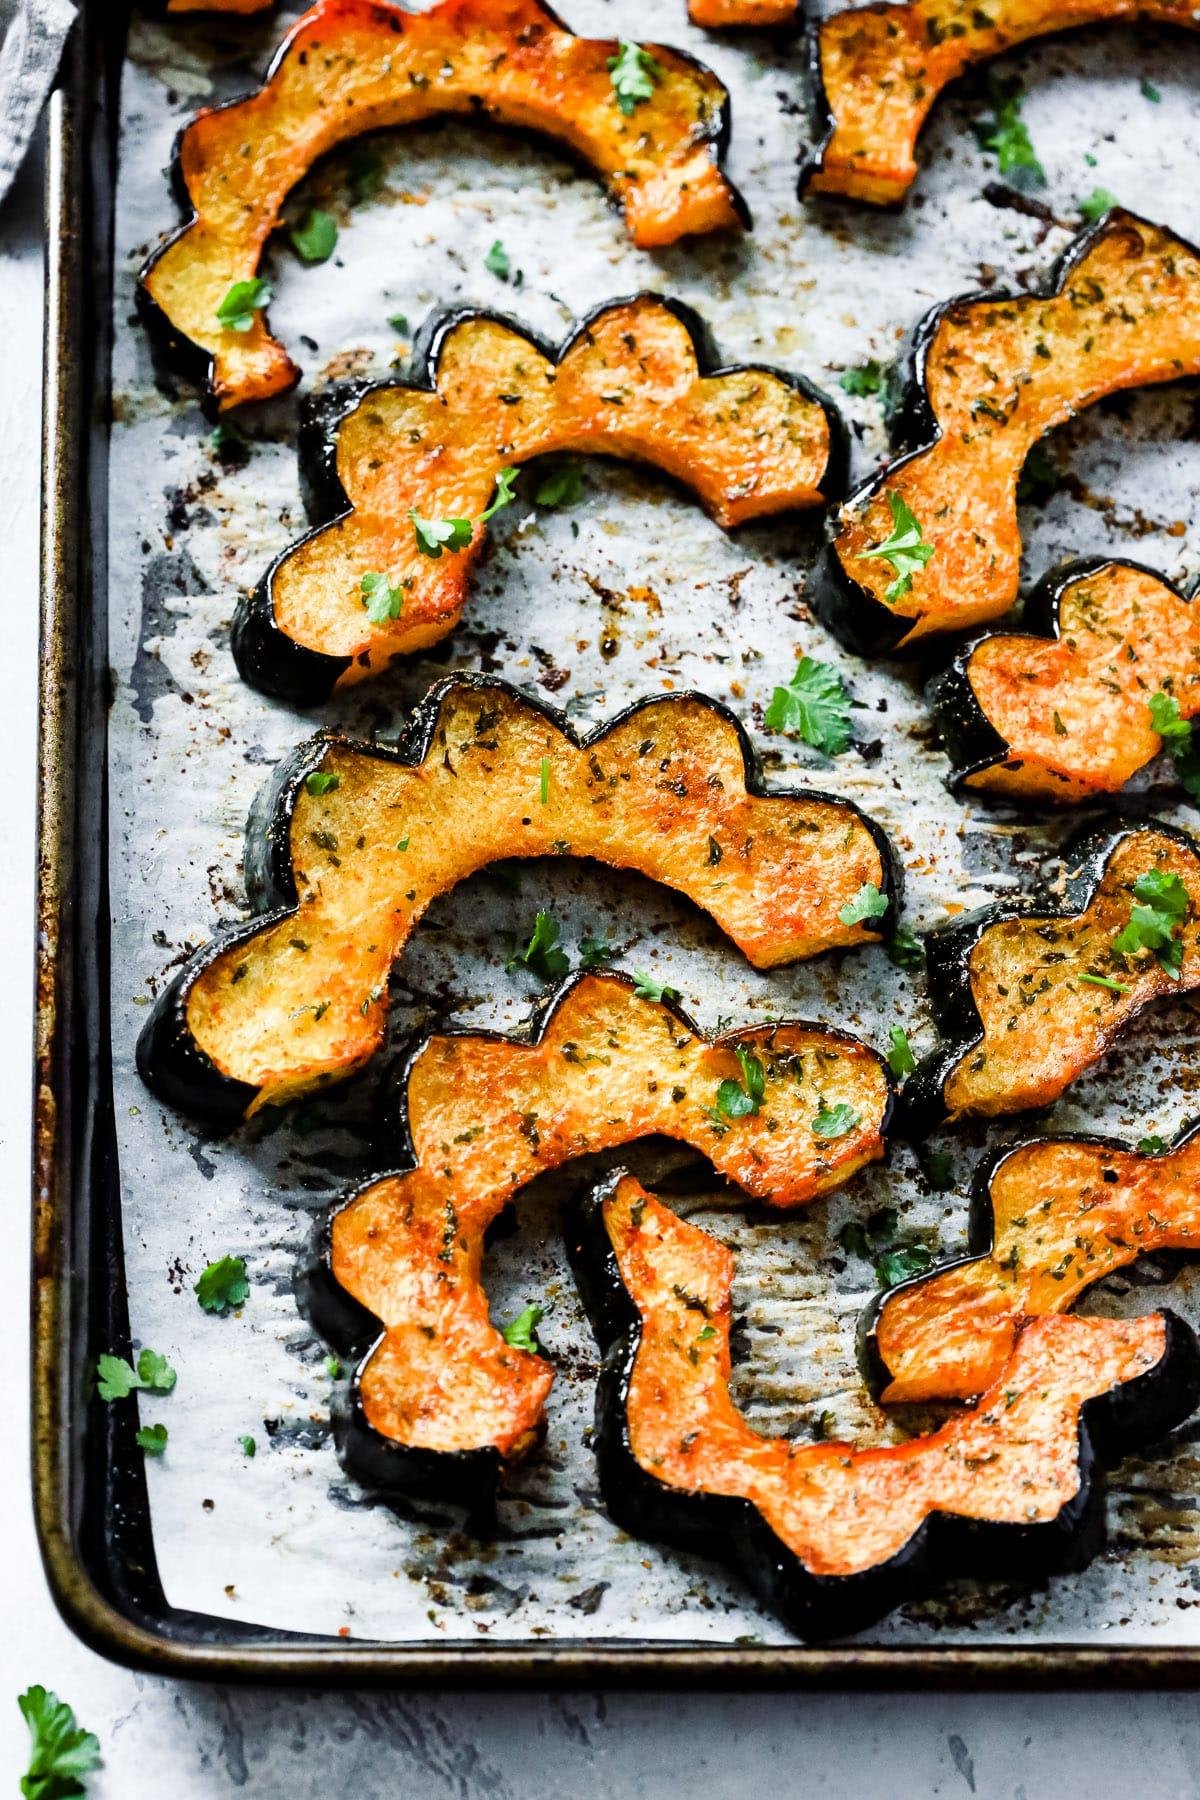 Easy Roasted Acorn Squash on a baking sheet